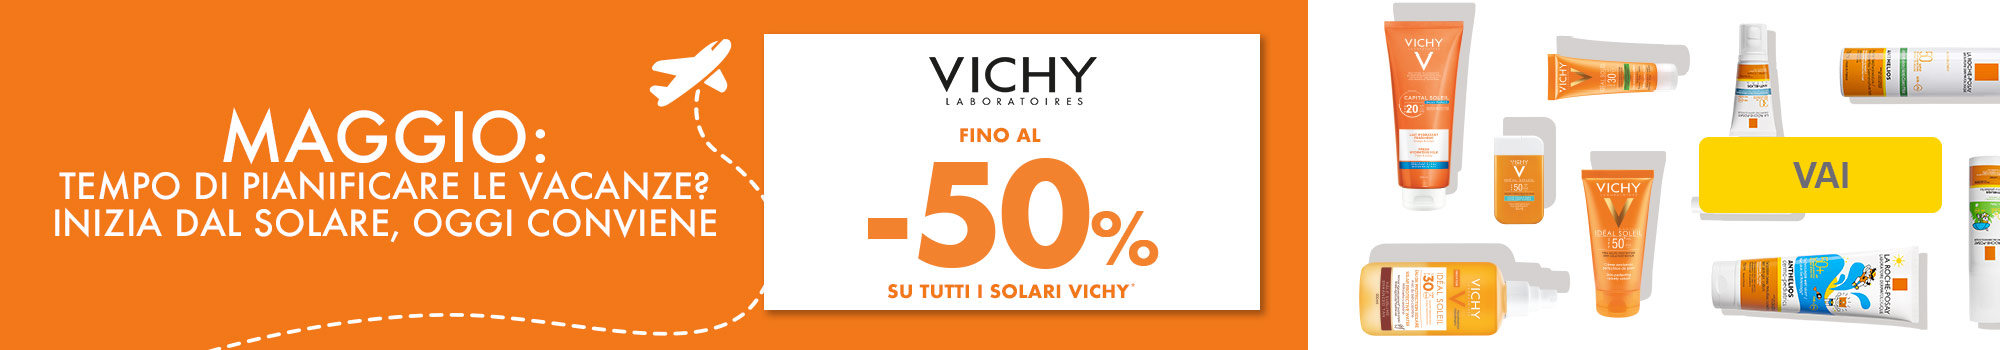 Vichy solari